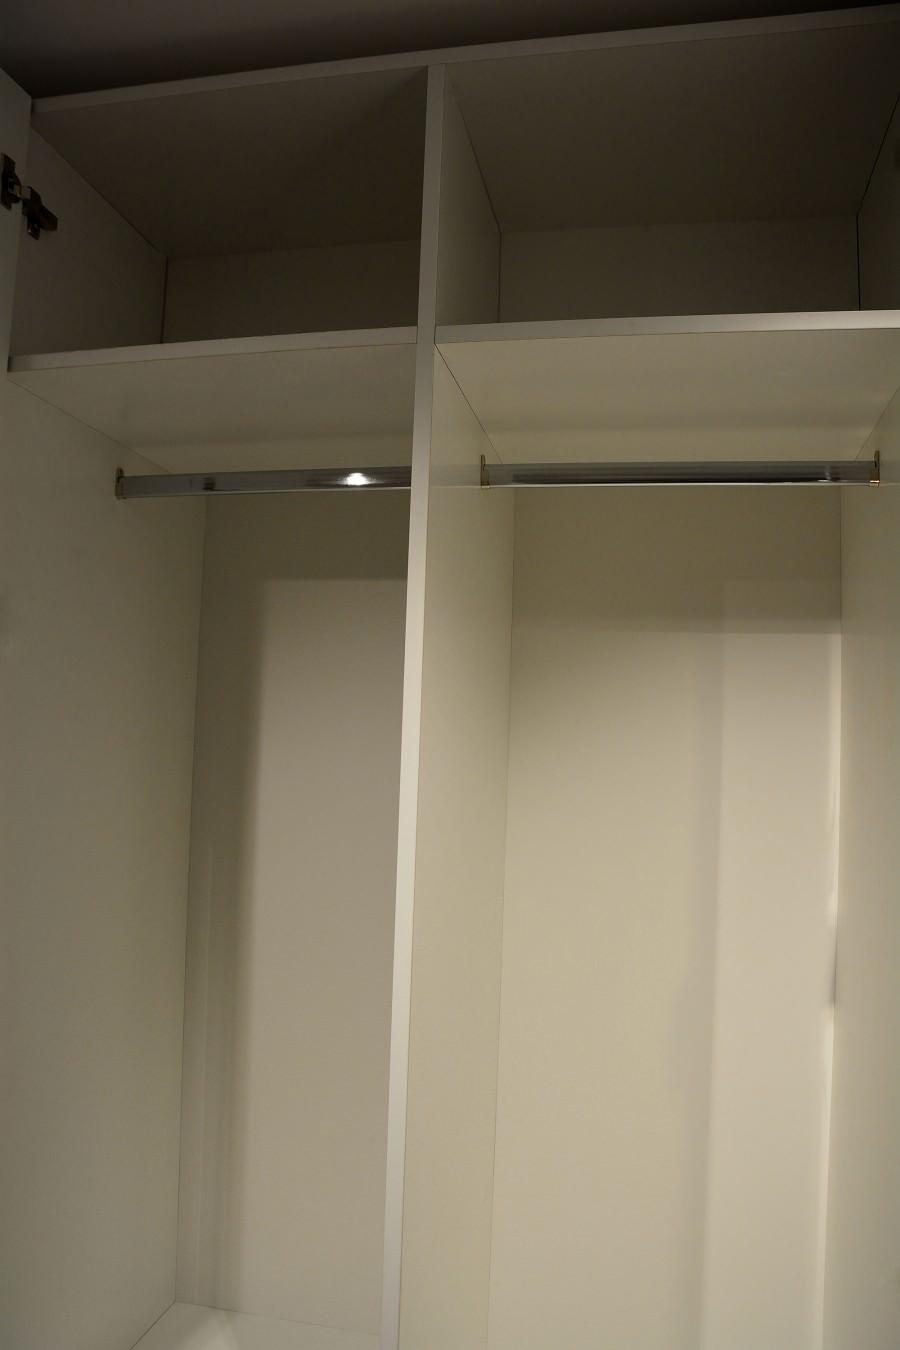 Bara de haine pentru dressing modern realizat din Pal Alb pe interior cu usi din Mdf Vopsit Mat cu frezare 900x1350 2